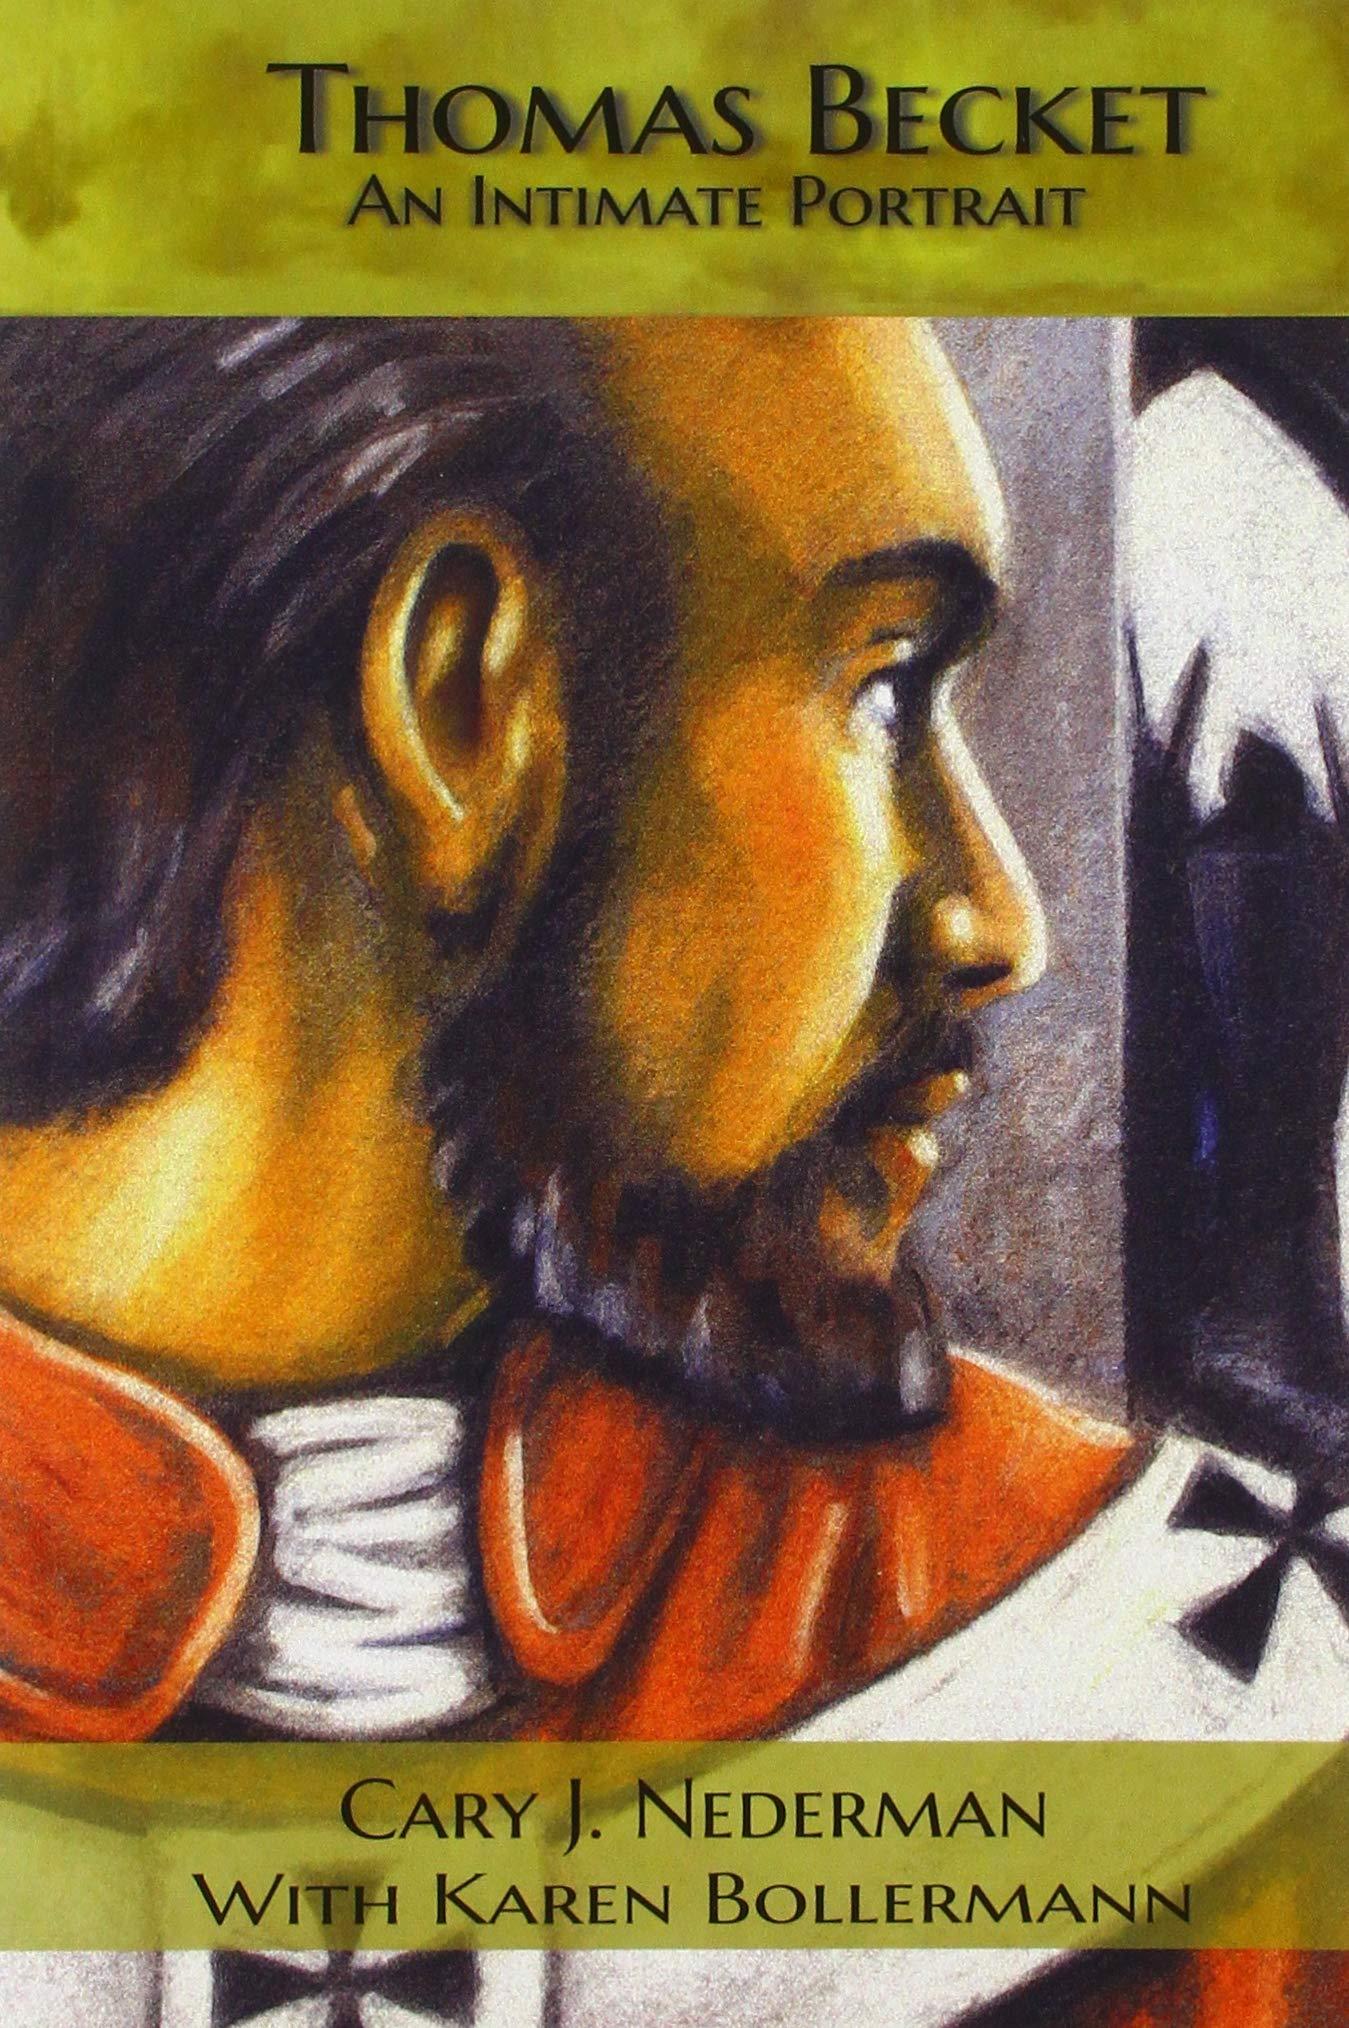 Thomas Becket An Intimate Portrait Cary J Nederman With Karen Bollermann 9780809154722 Amazon Com Books